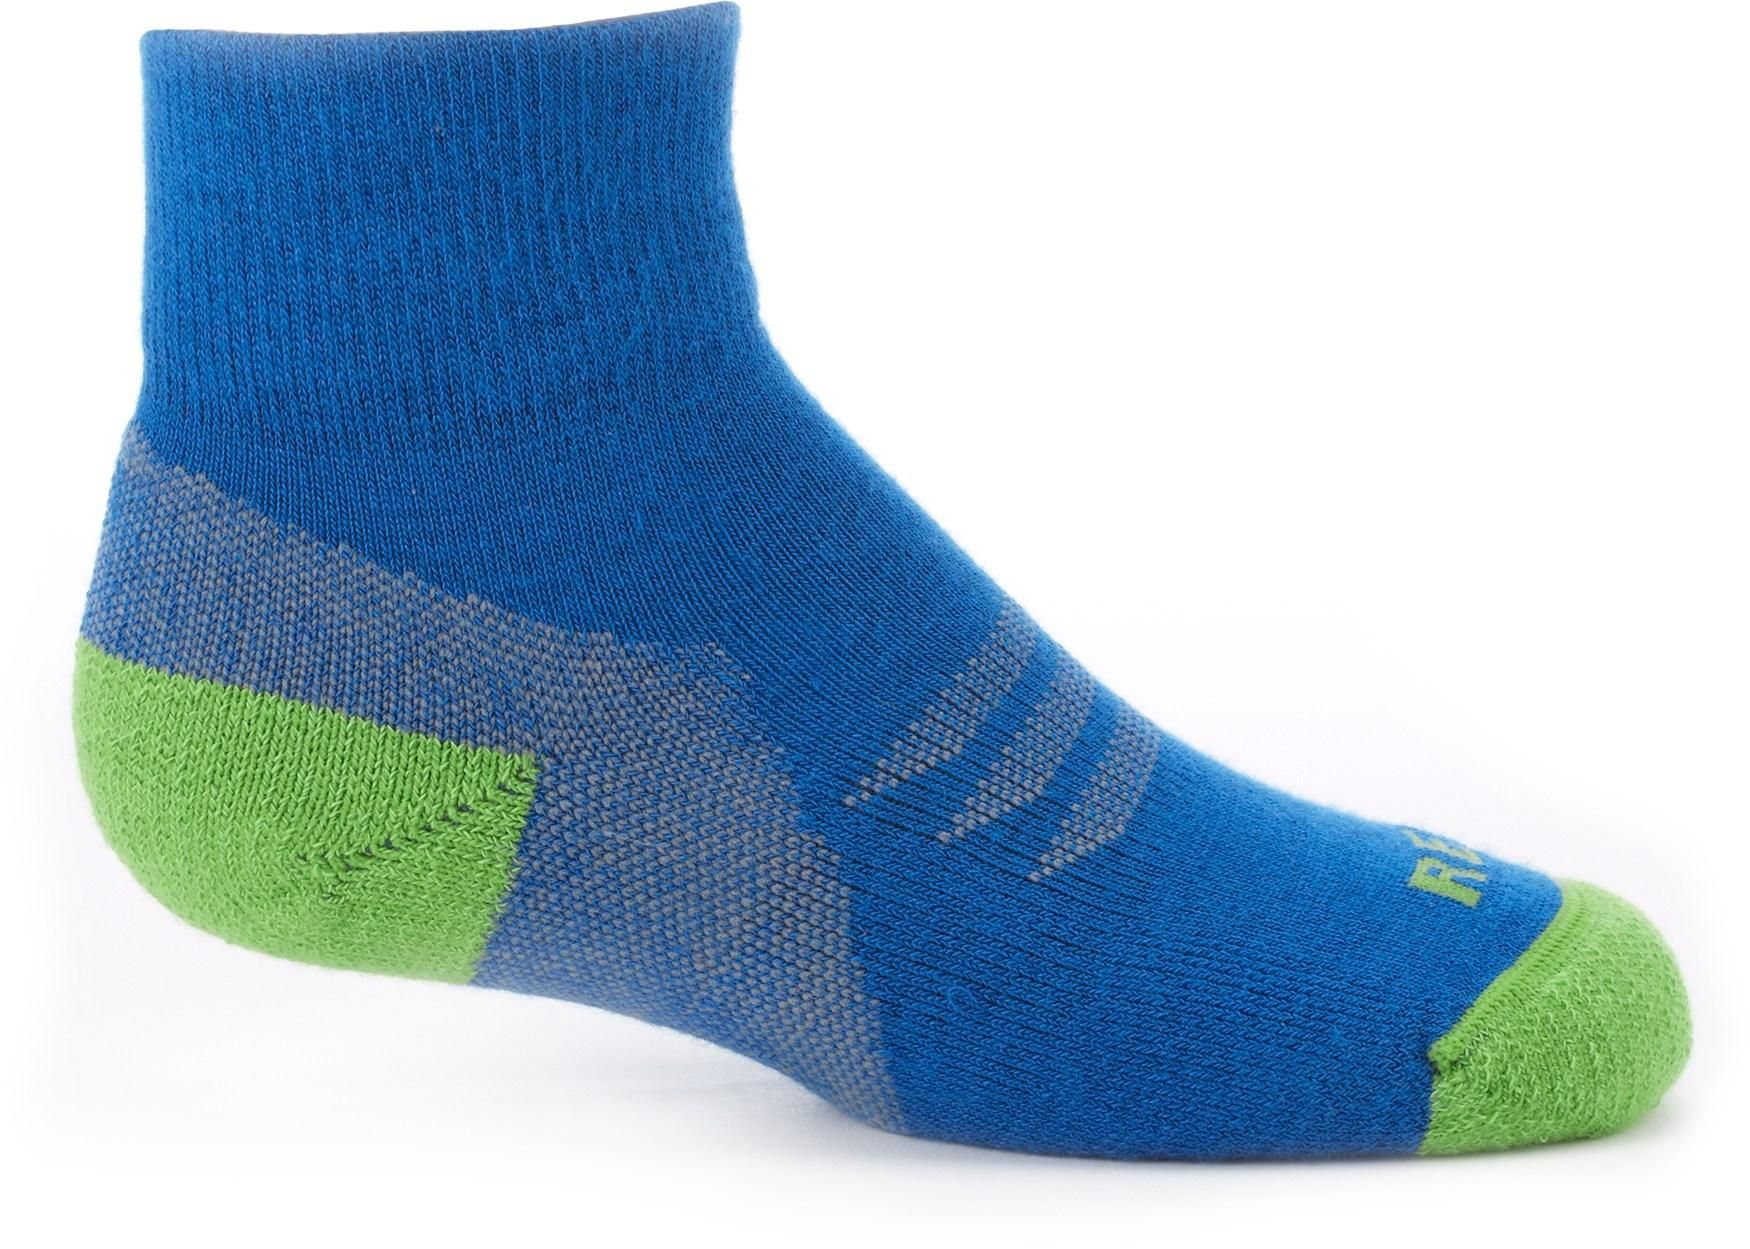 Boys' REI CoolMax EcoMade Quarter Socks